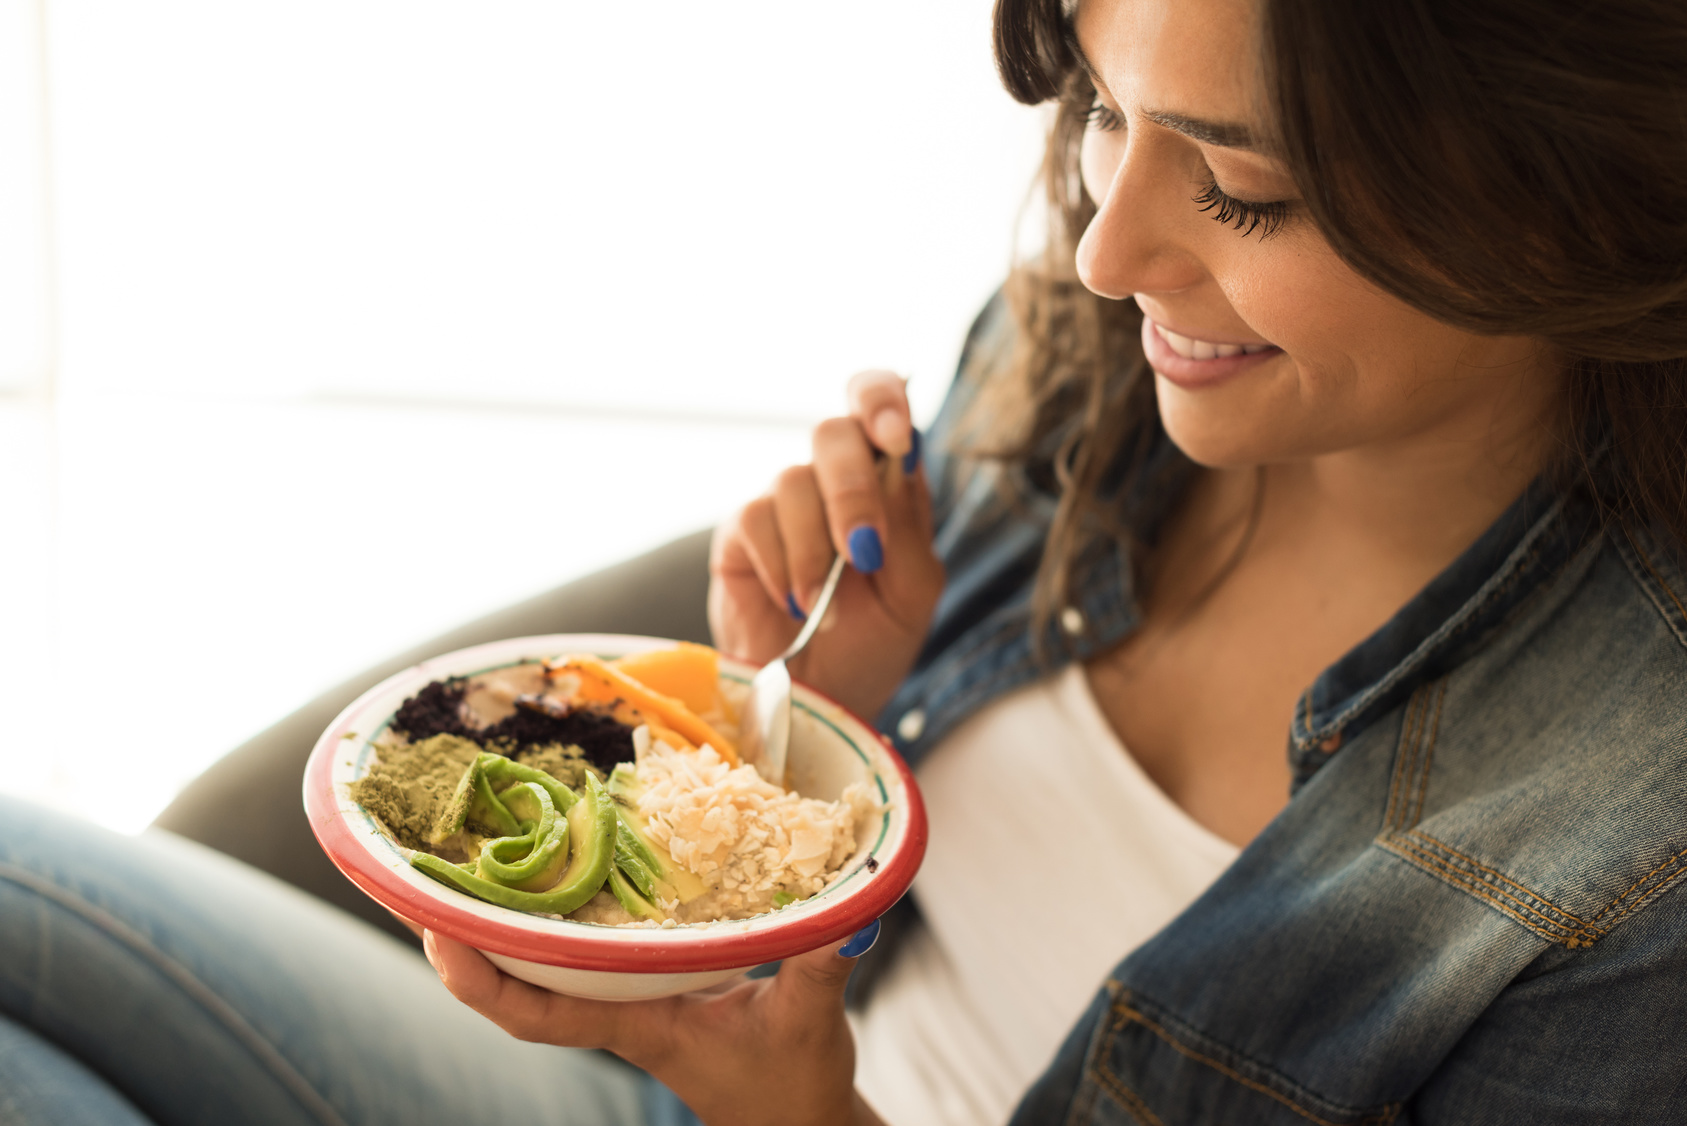 Problemas para ir al ba o 10 alimentos que deber as comer hola mujer - Alimentos para ir al bano inmediatamente ...